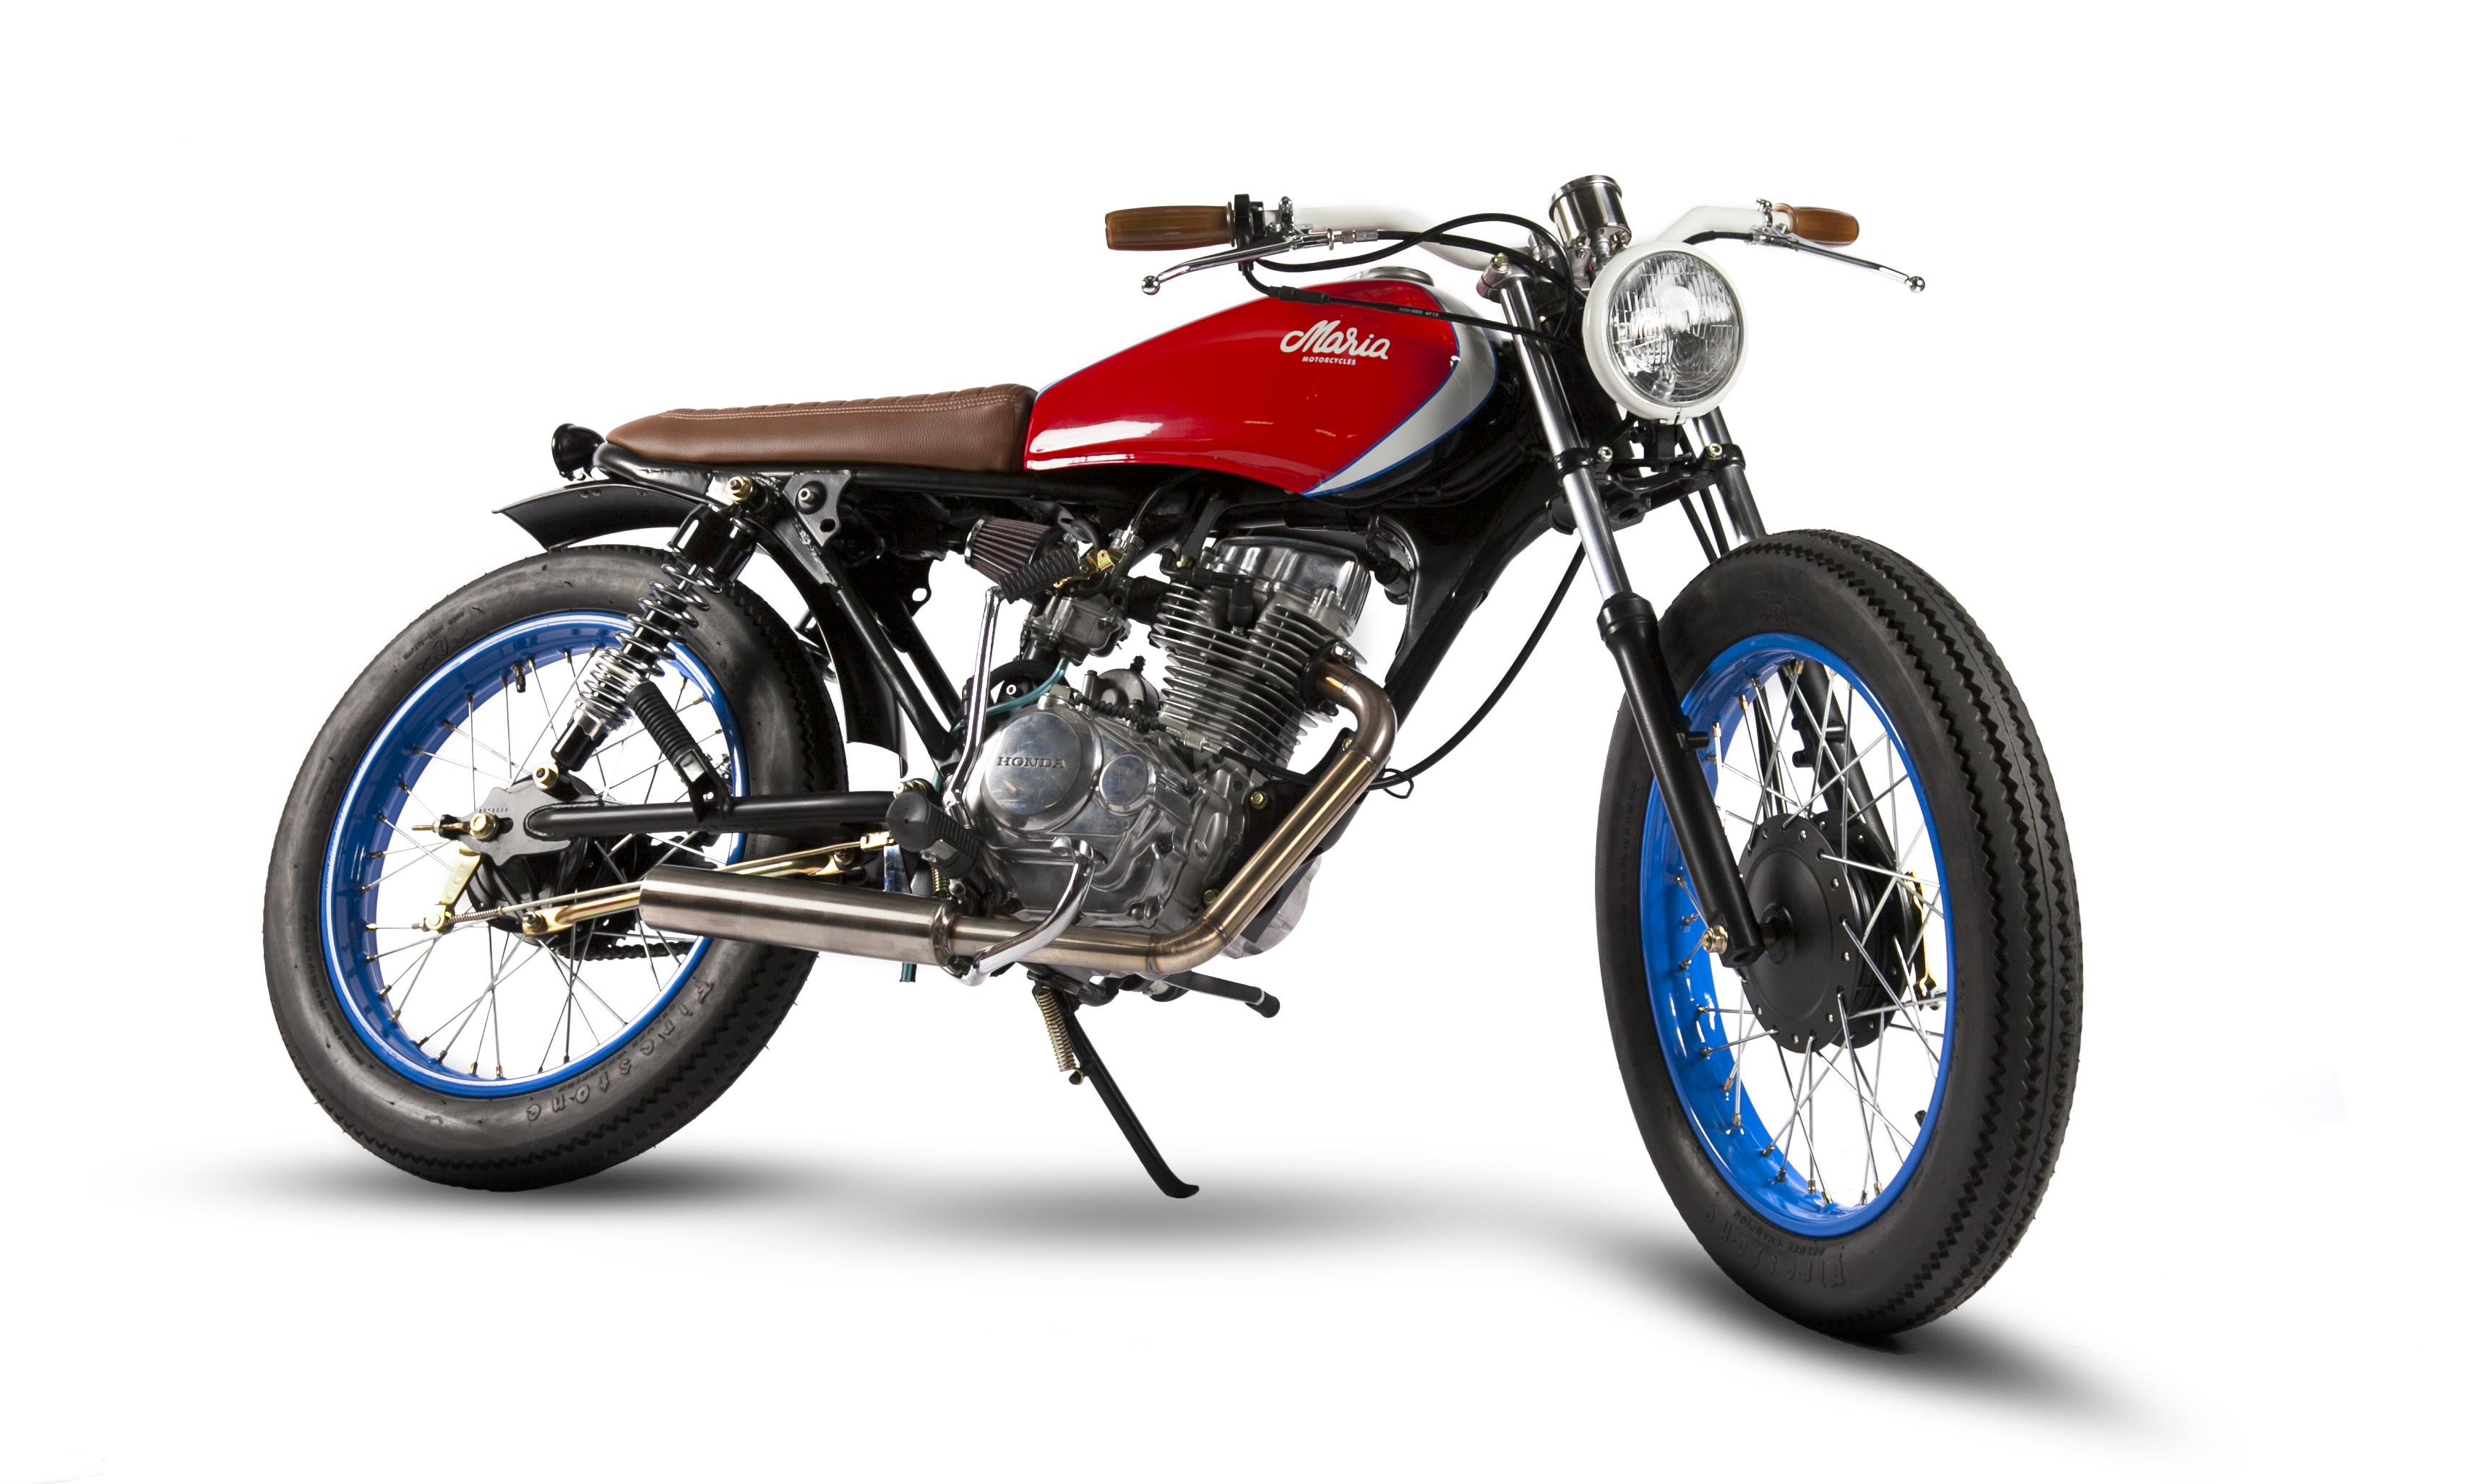 maria_motorcycles_honda_cg125_beladonna_3785